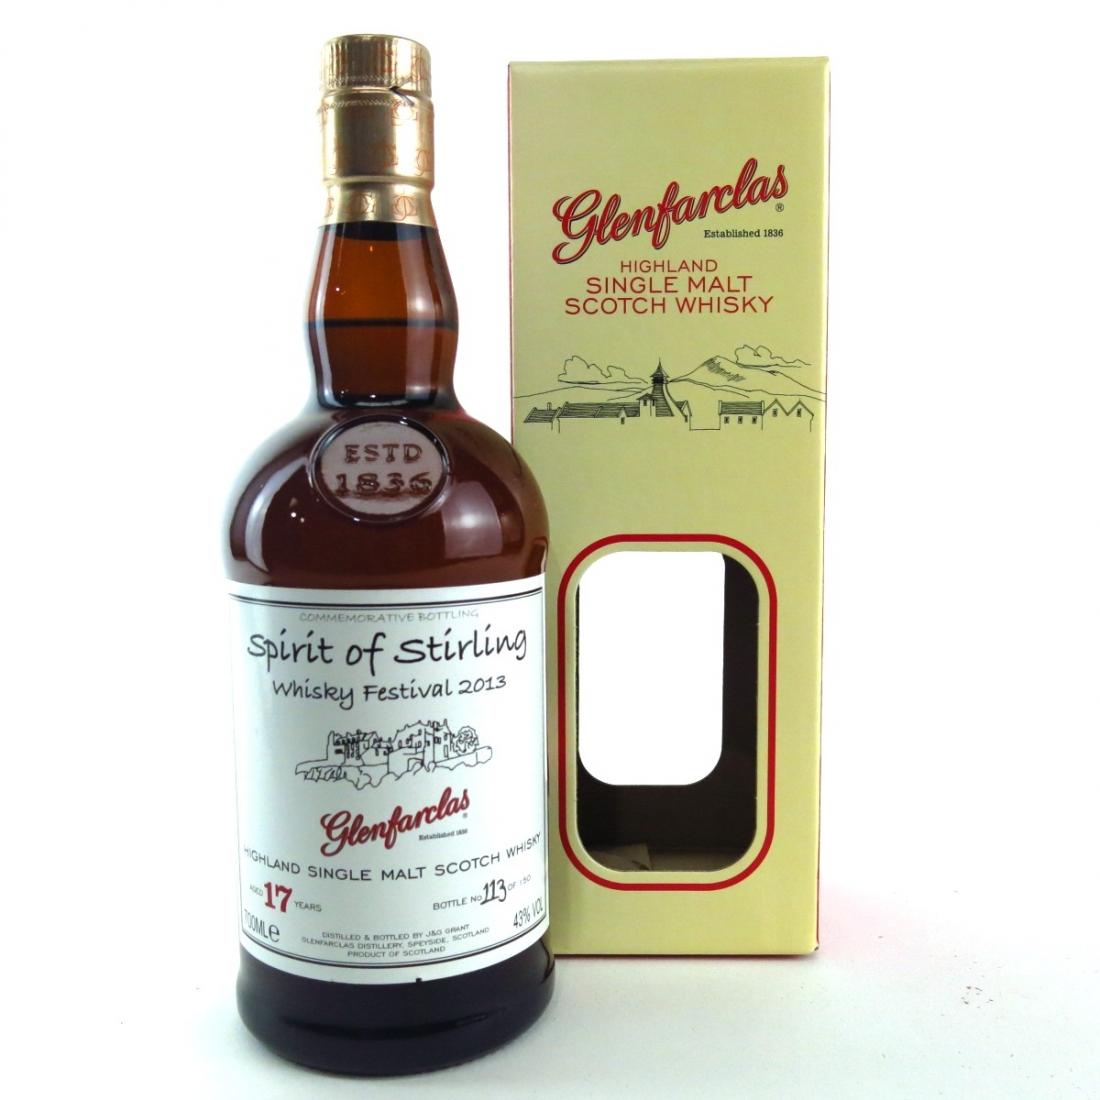 Glenfarclas 17 Year Old / Spirit of Stirling Whisky Festival 2013